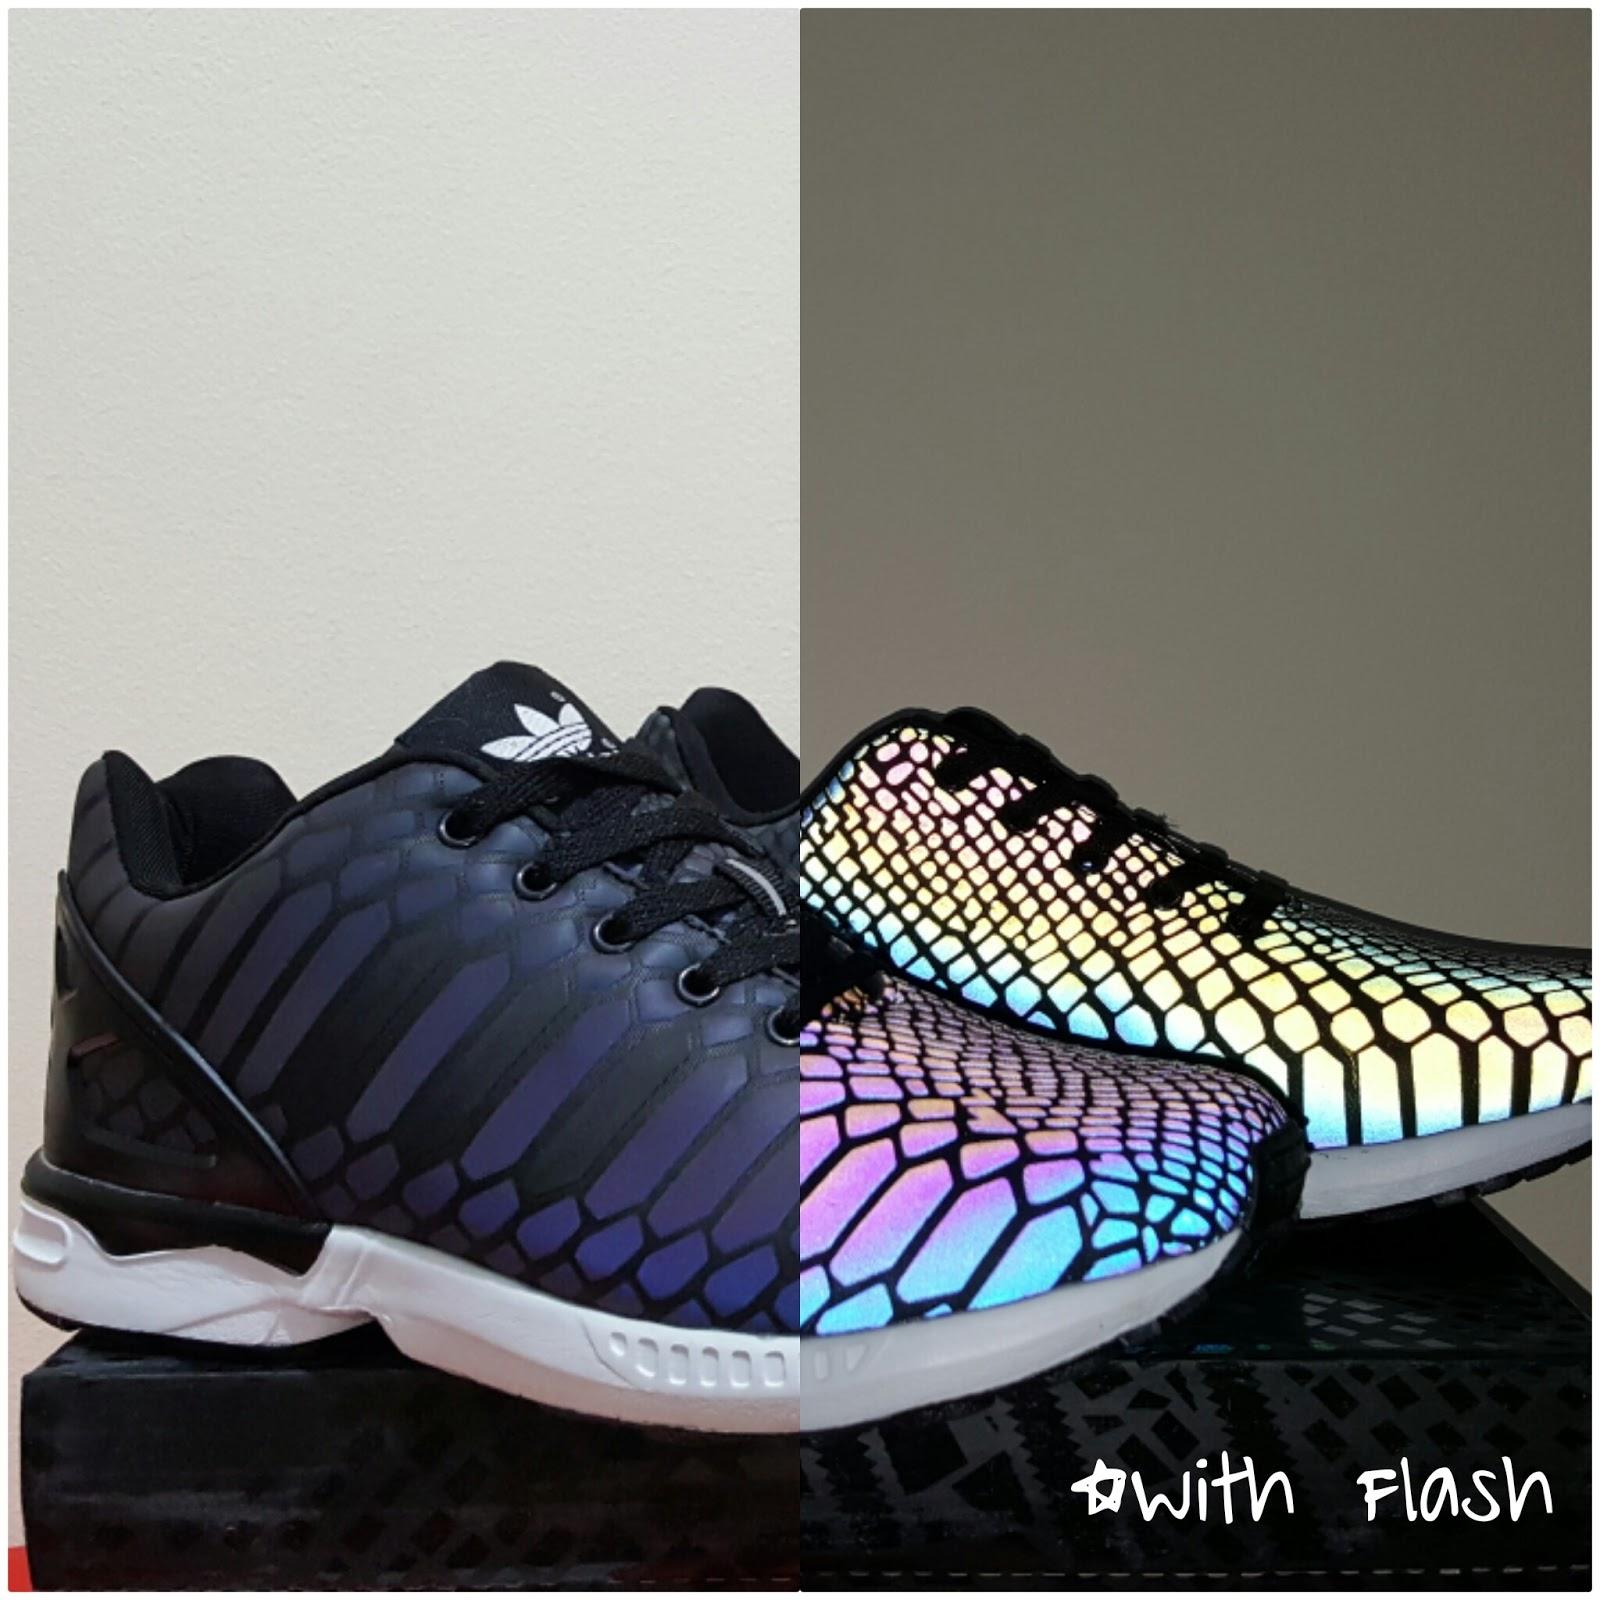 1af0856431dab ... sweden harga adidas zx flux original jual adidas zx flux kw 8f4b4 7b8be